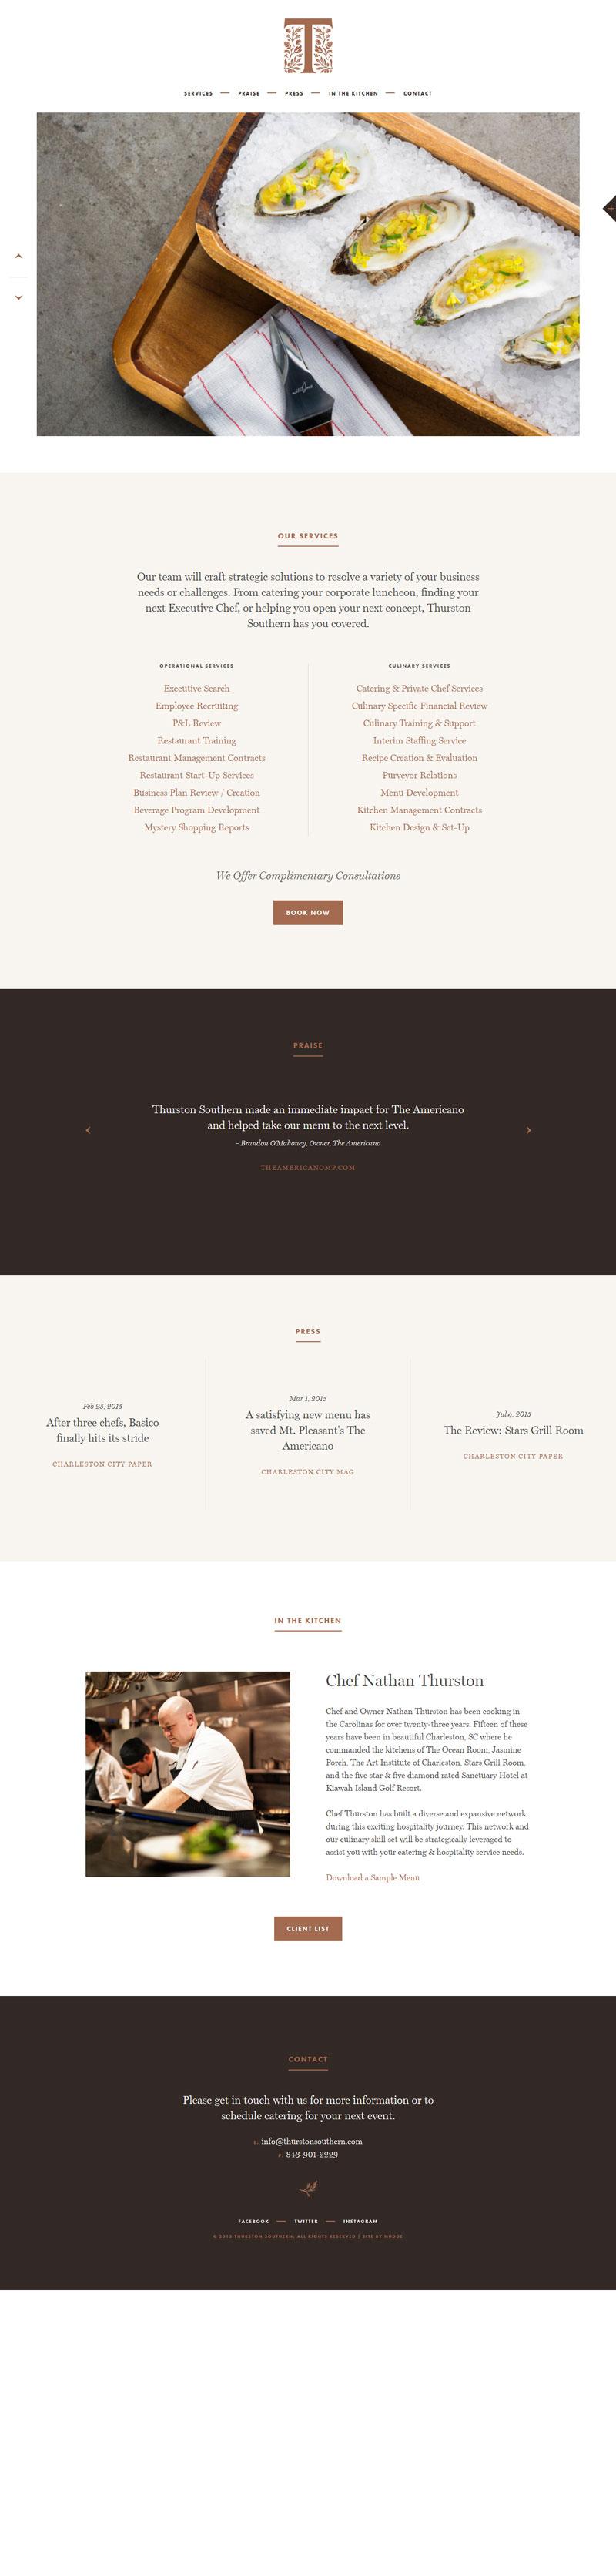 Thurston Southern Flat Design Web Template Design Web Design Website Design